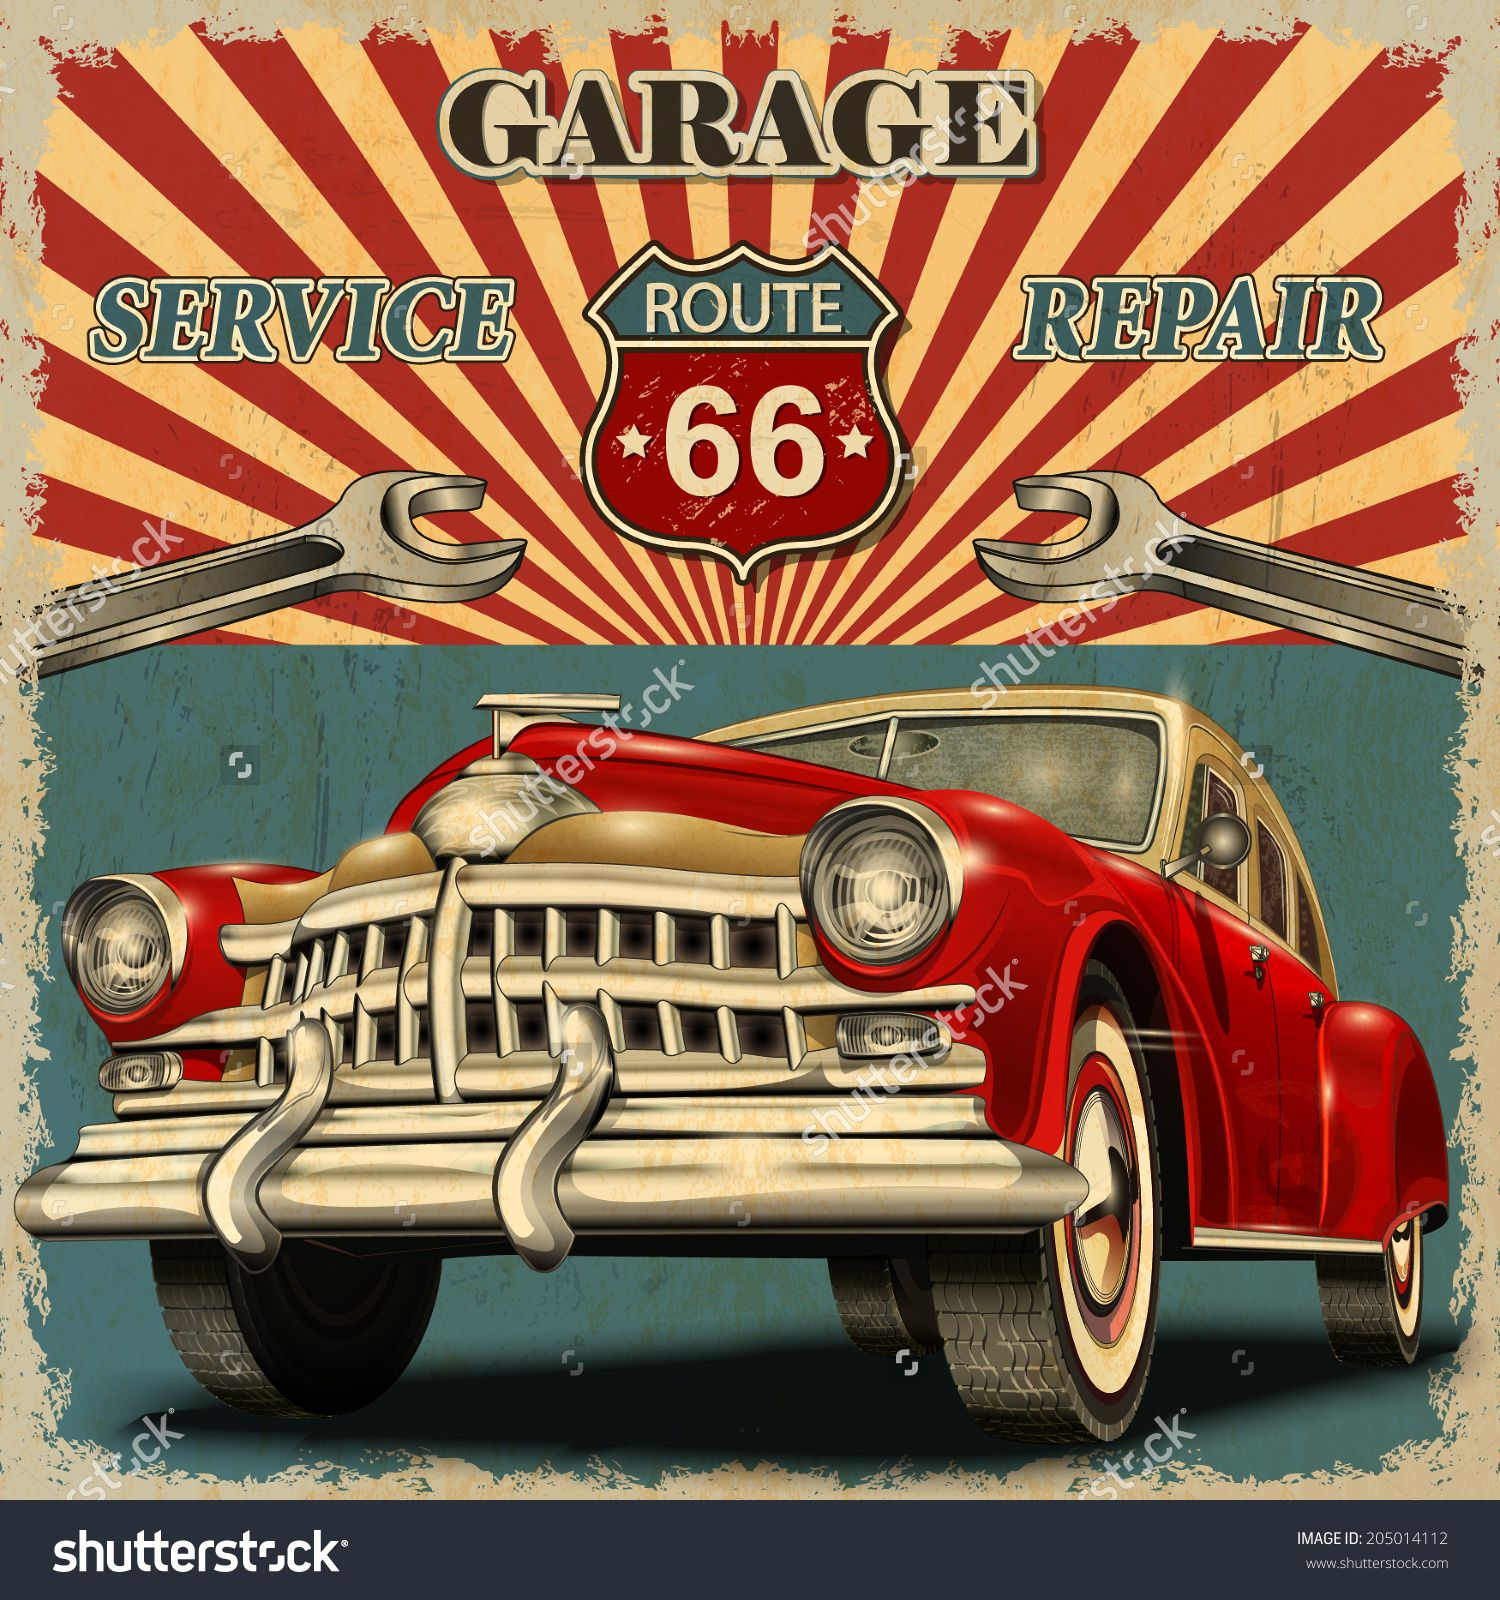 Poster vintage music pesquisa google imagens for Garage route 66 metz